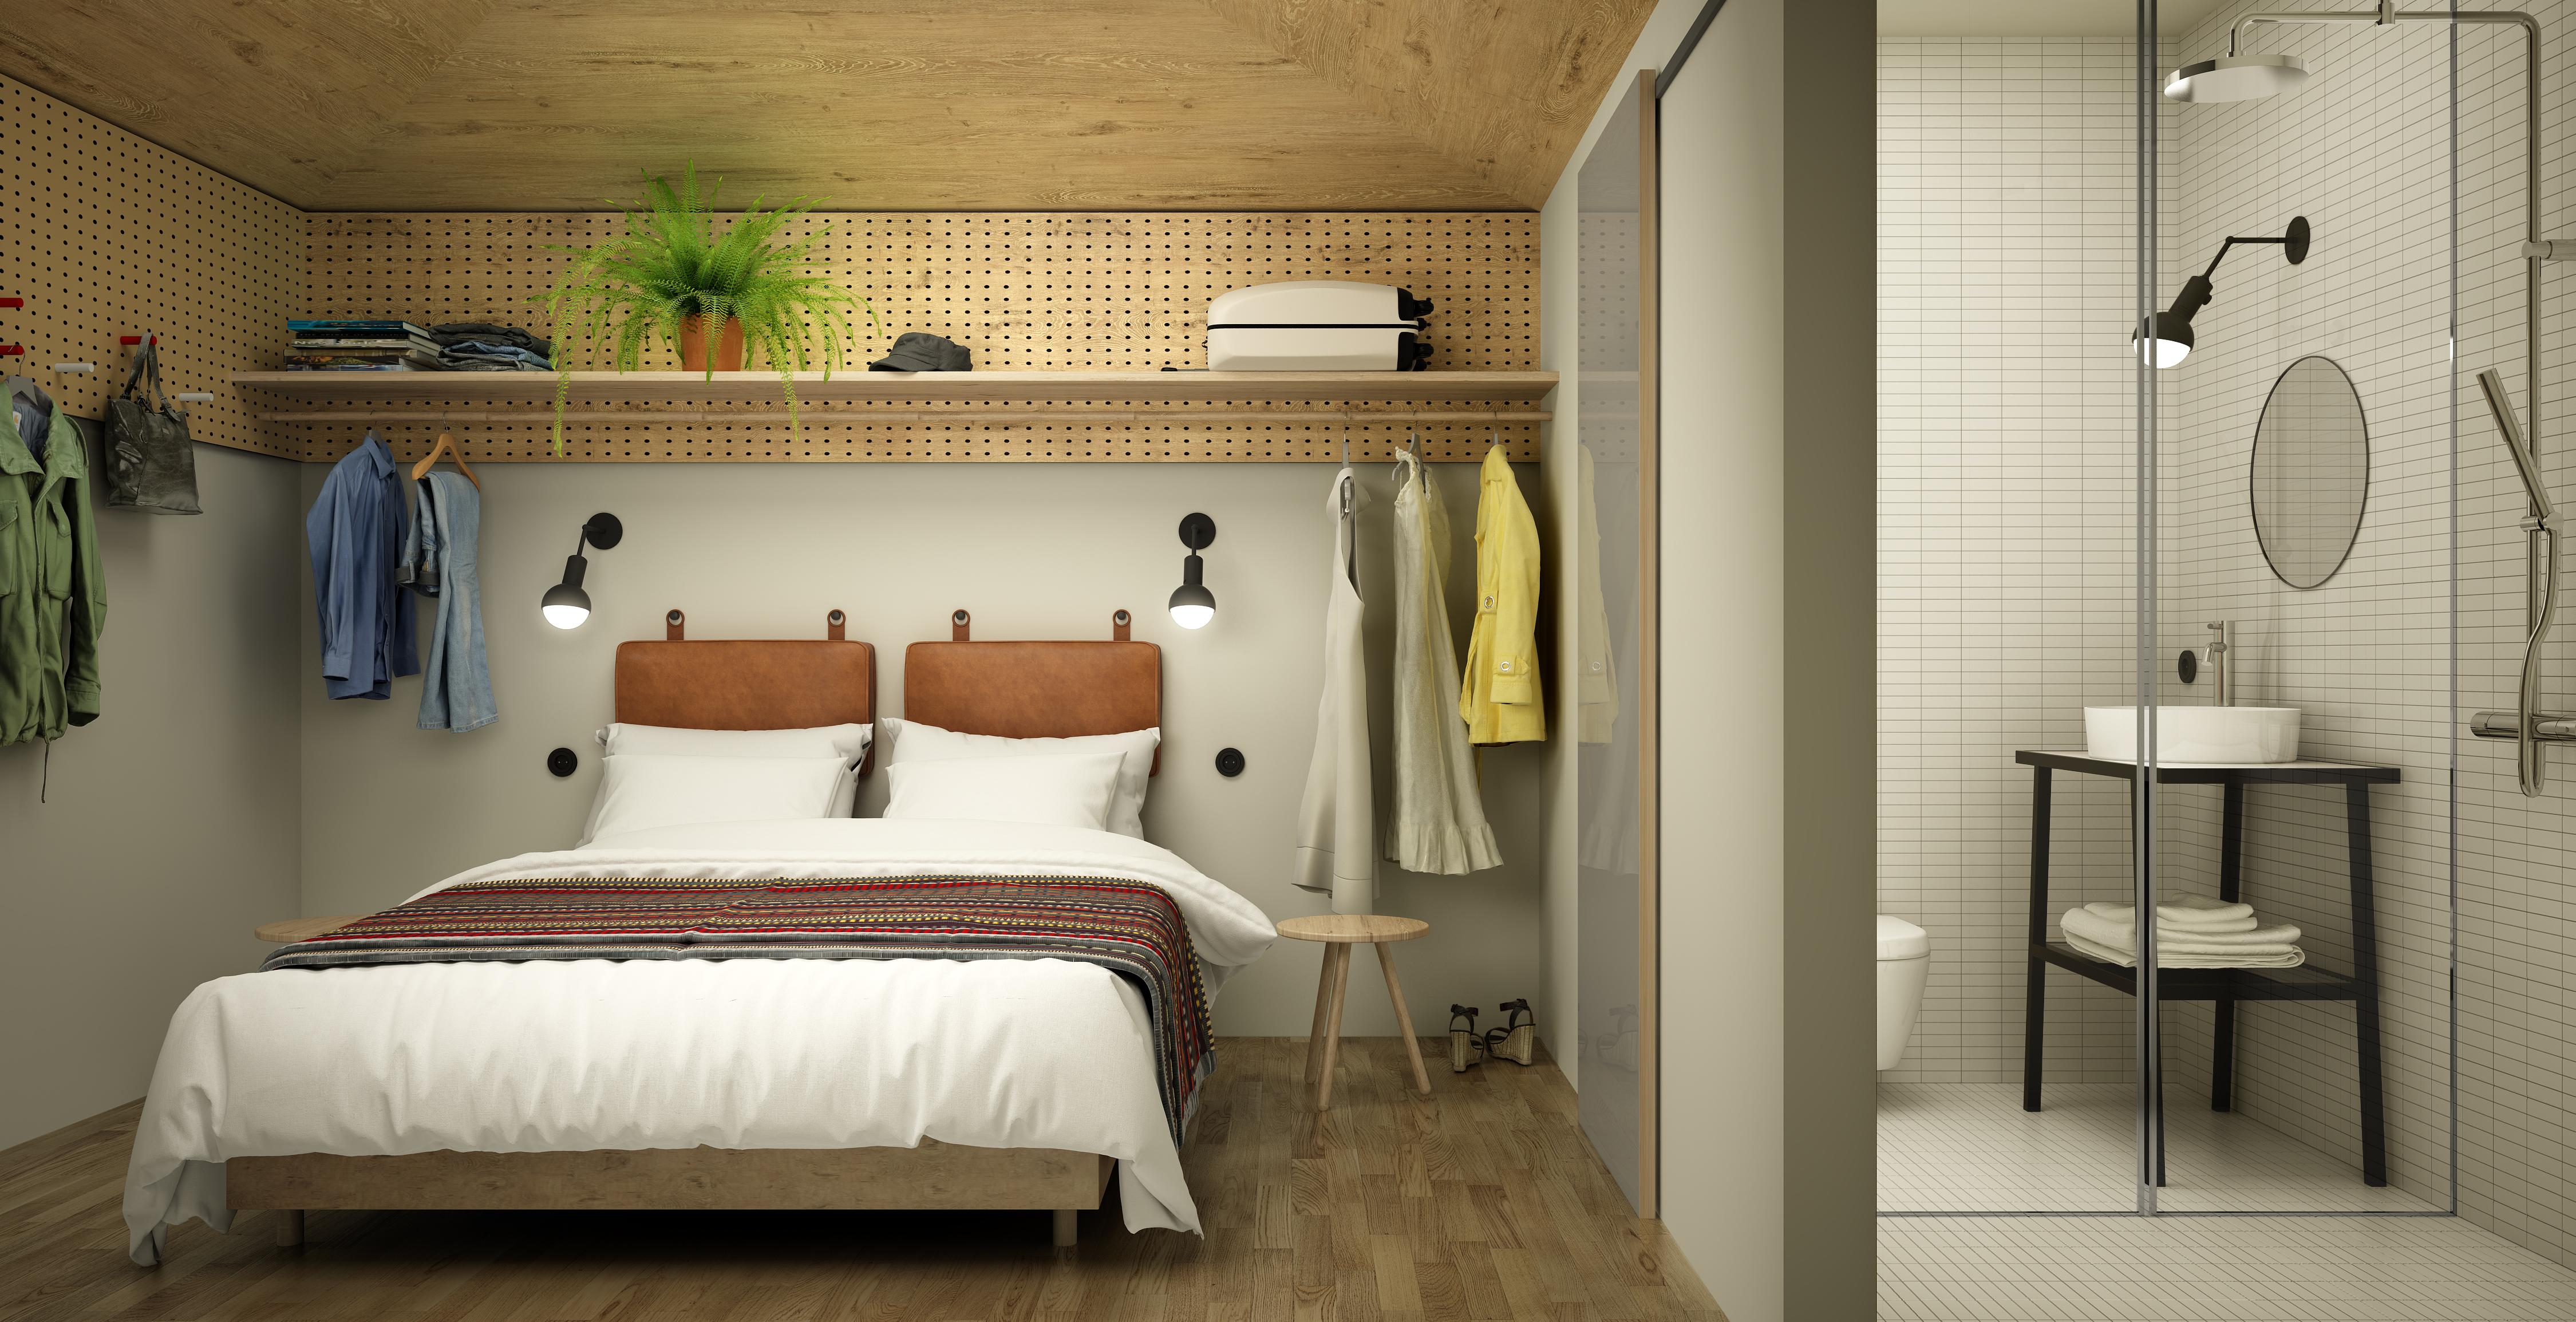 2017-08-Hobo-Stockholm - HOBO_Room_and-_Bathroom.jpg